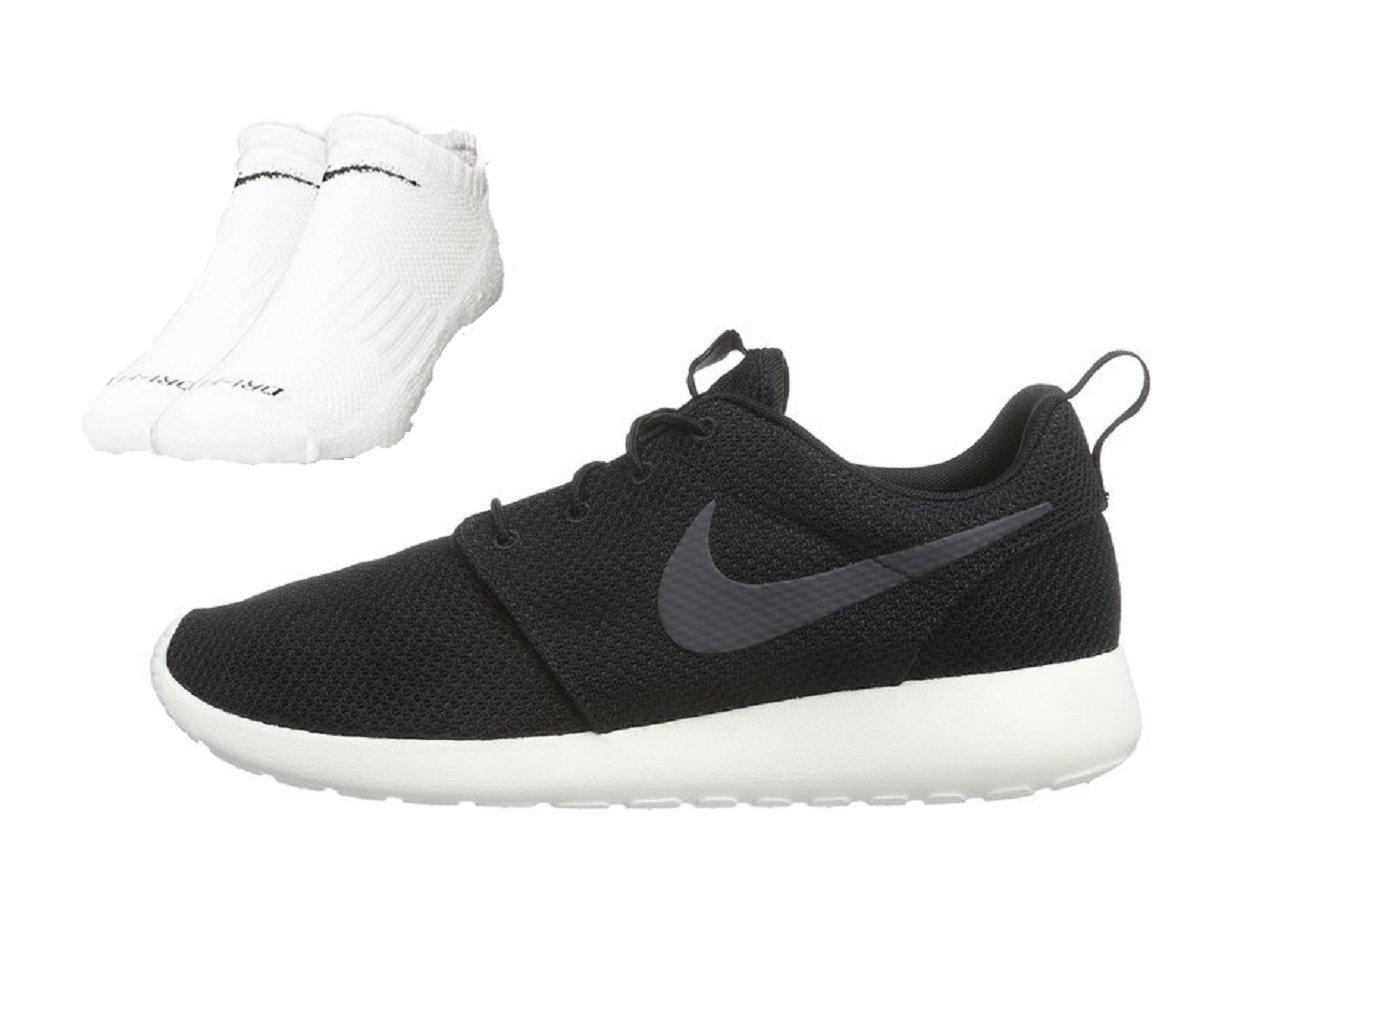 Nike Shoe Combos